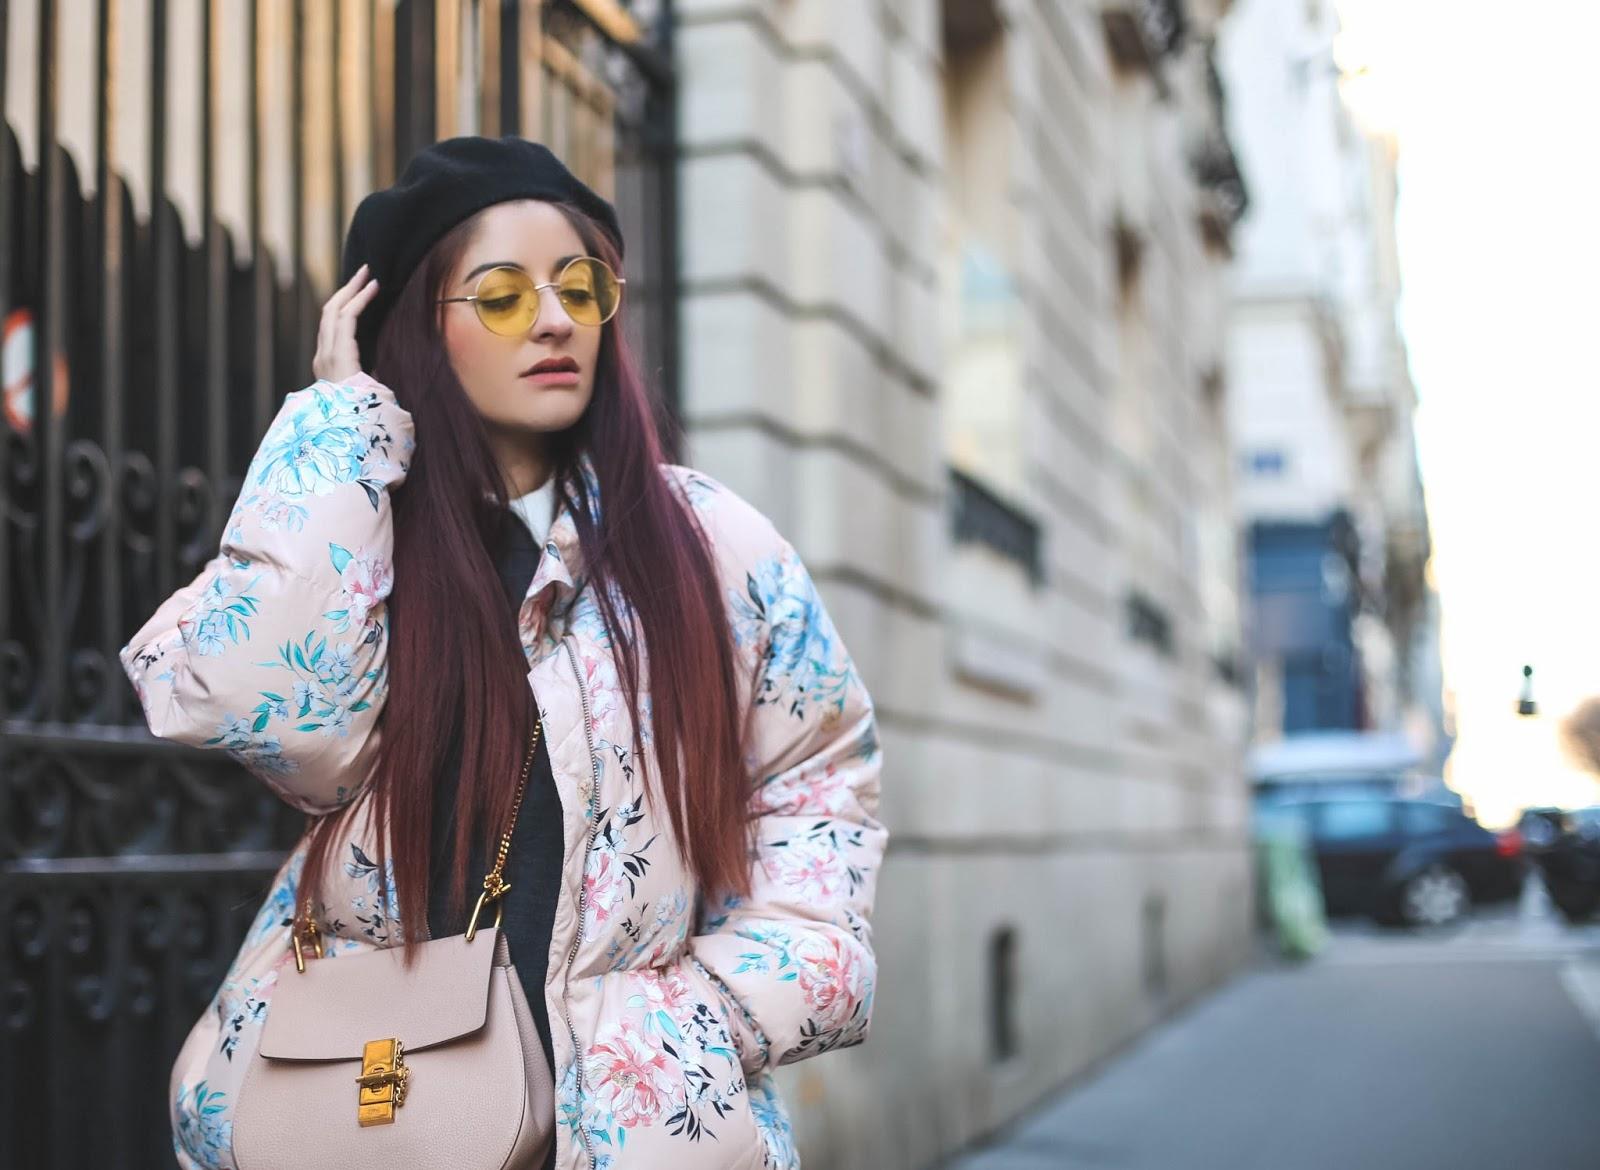 lunettes jaunes rondes retro blog mode paris